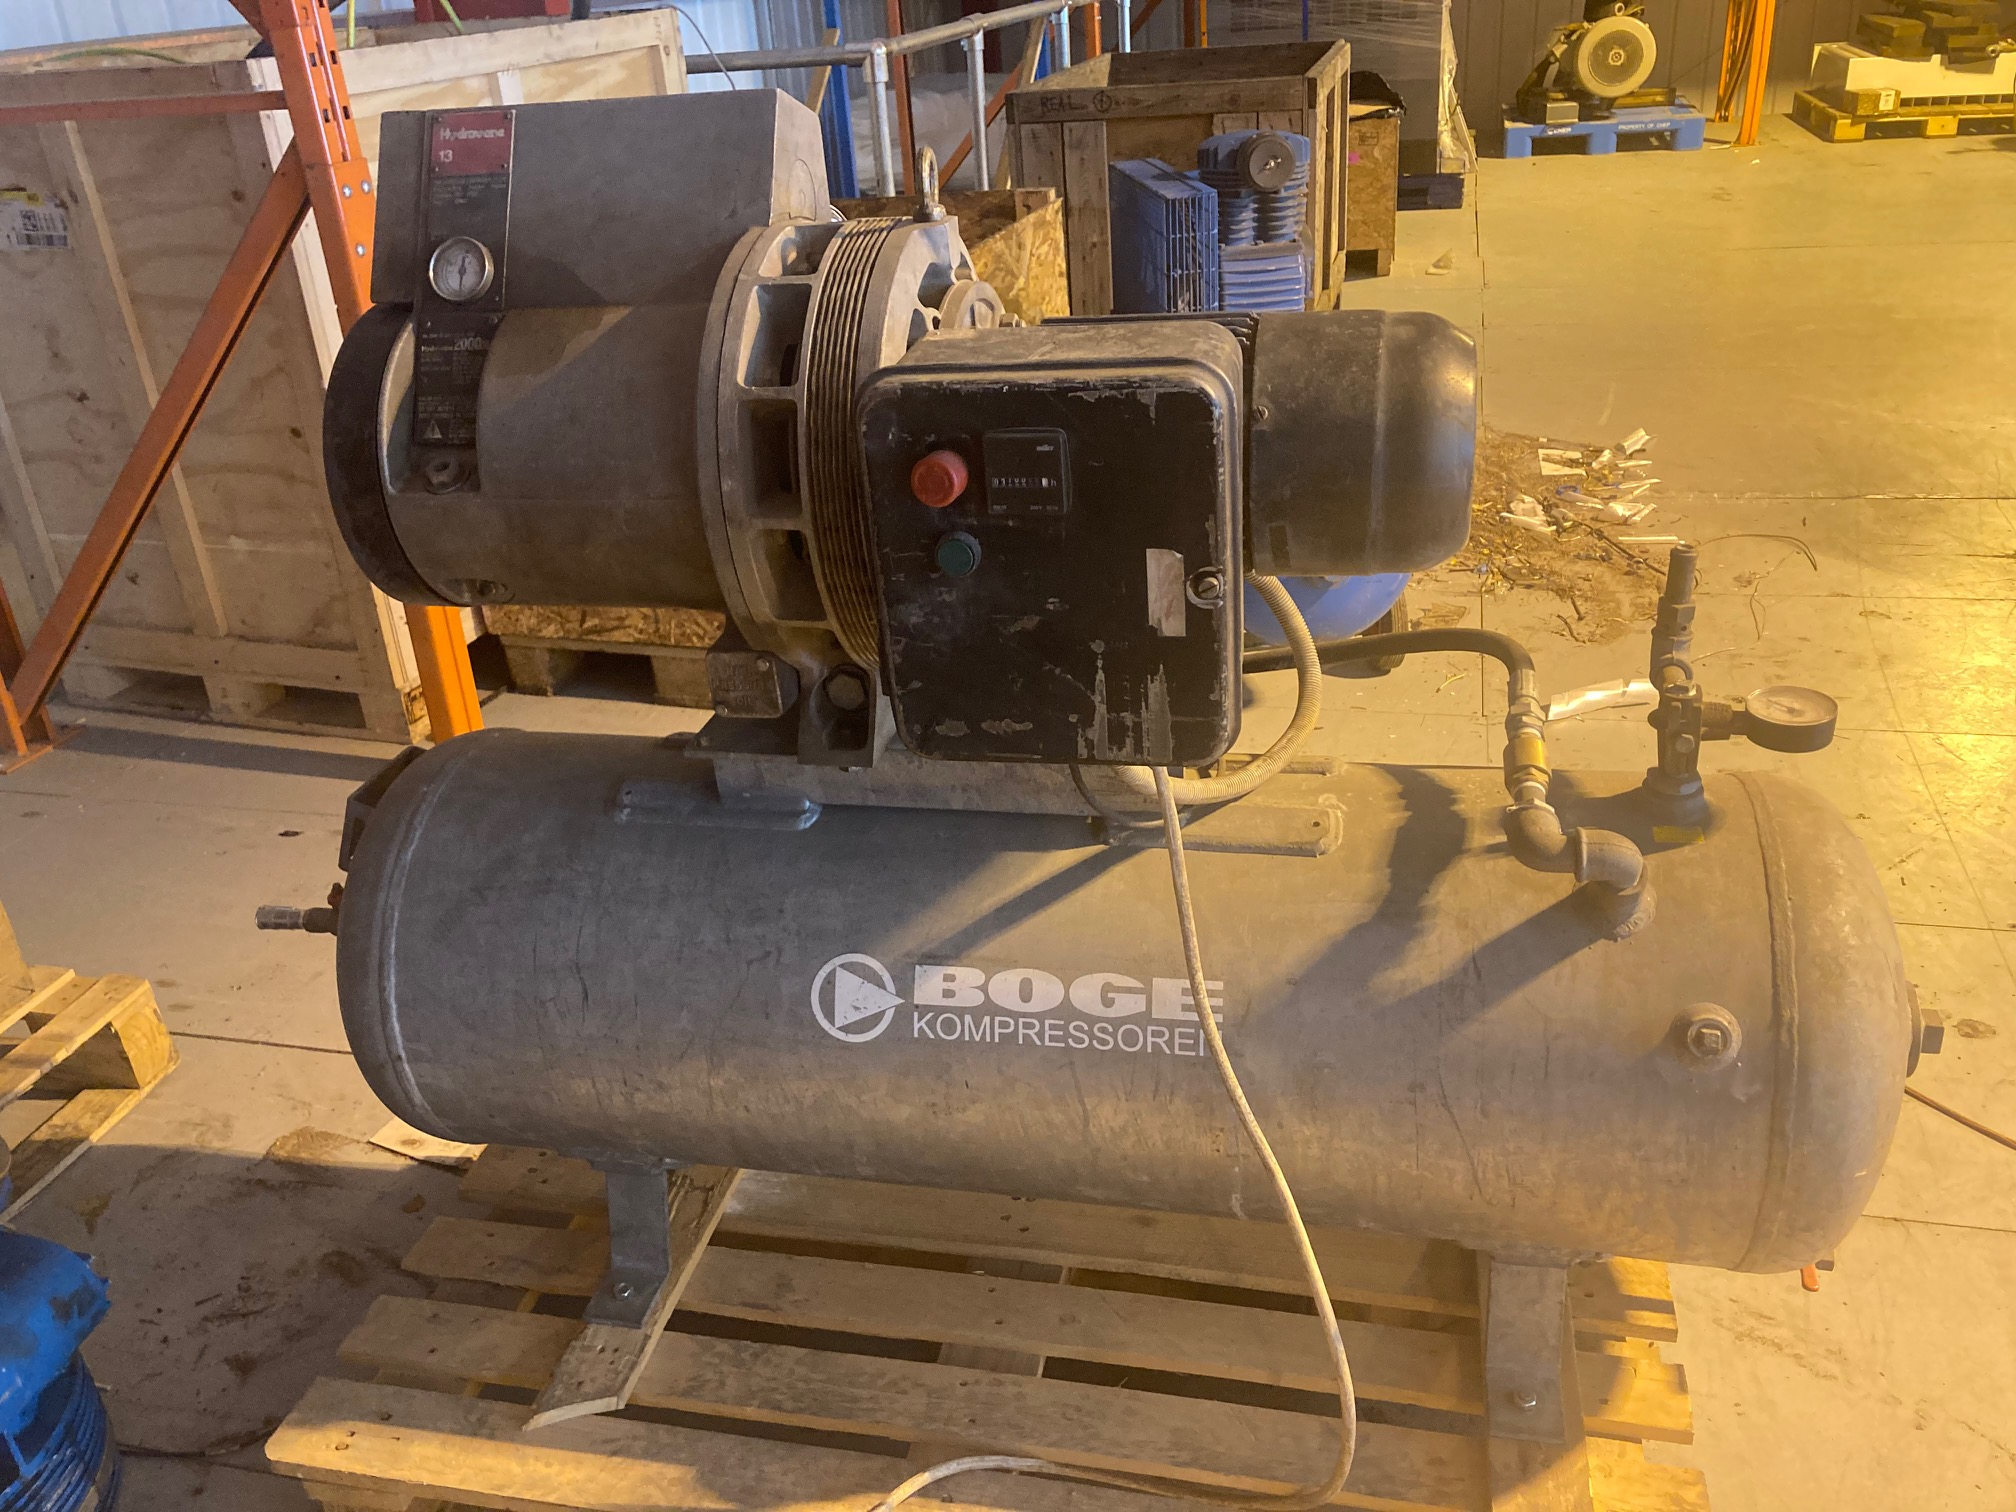 Hydrovane 13 240 volt 12cfm hire compressor